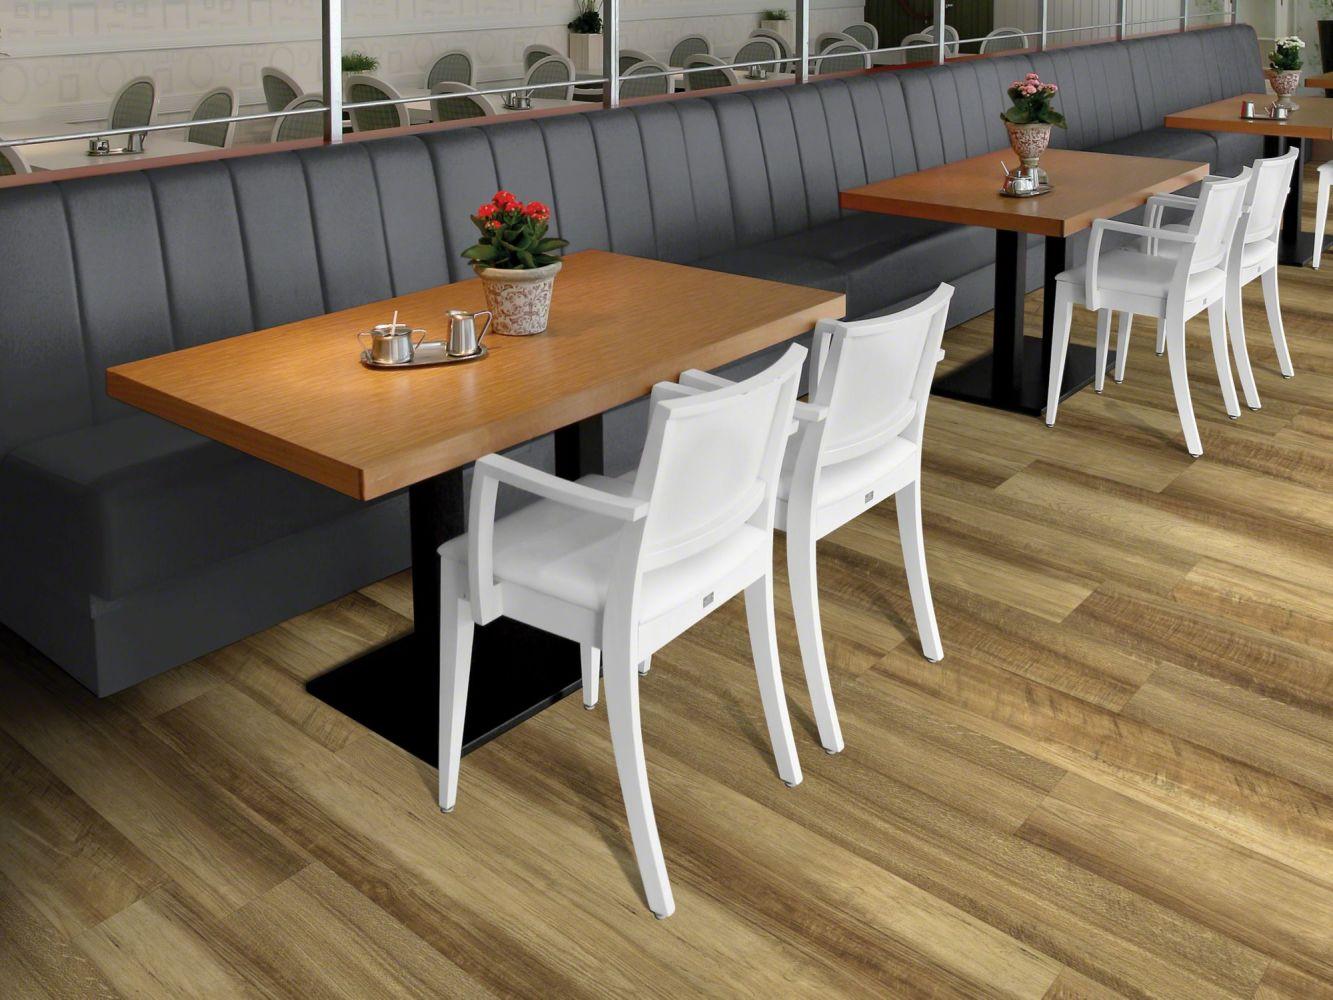 Shaw Floors 5th And Main Designation Joist 00203_5M225